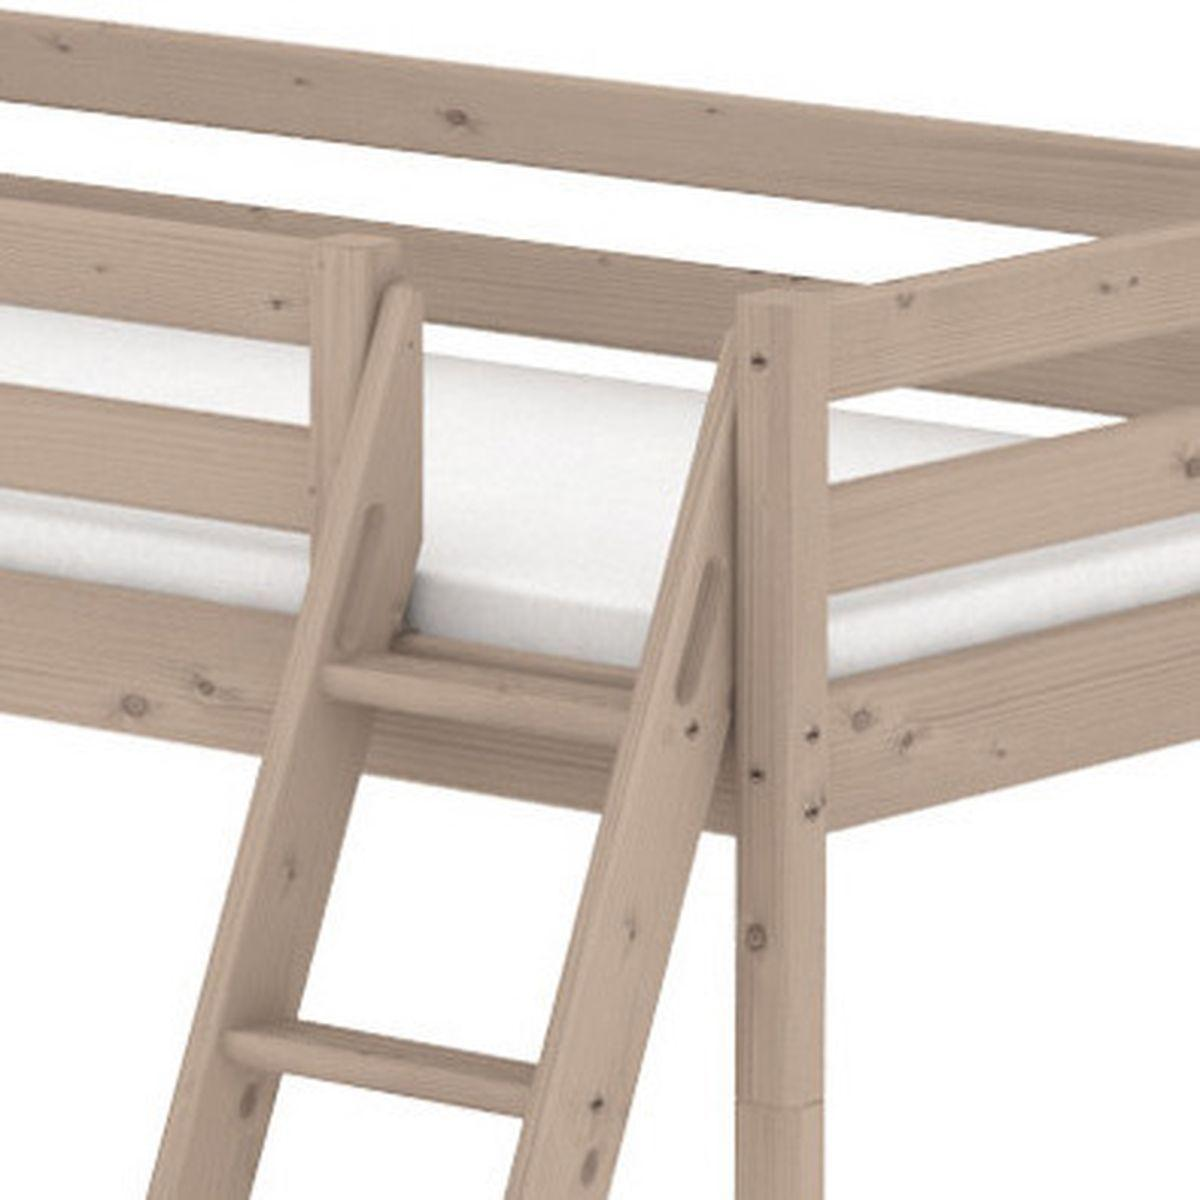 Cama media alta 90x190 CLASSIC Flexa escalera inclinada terra